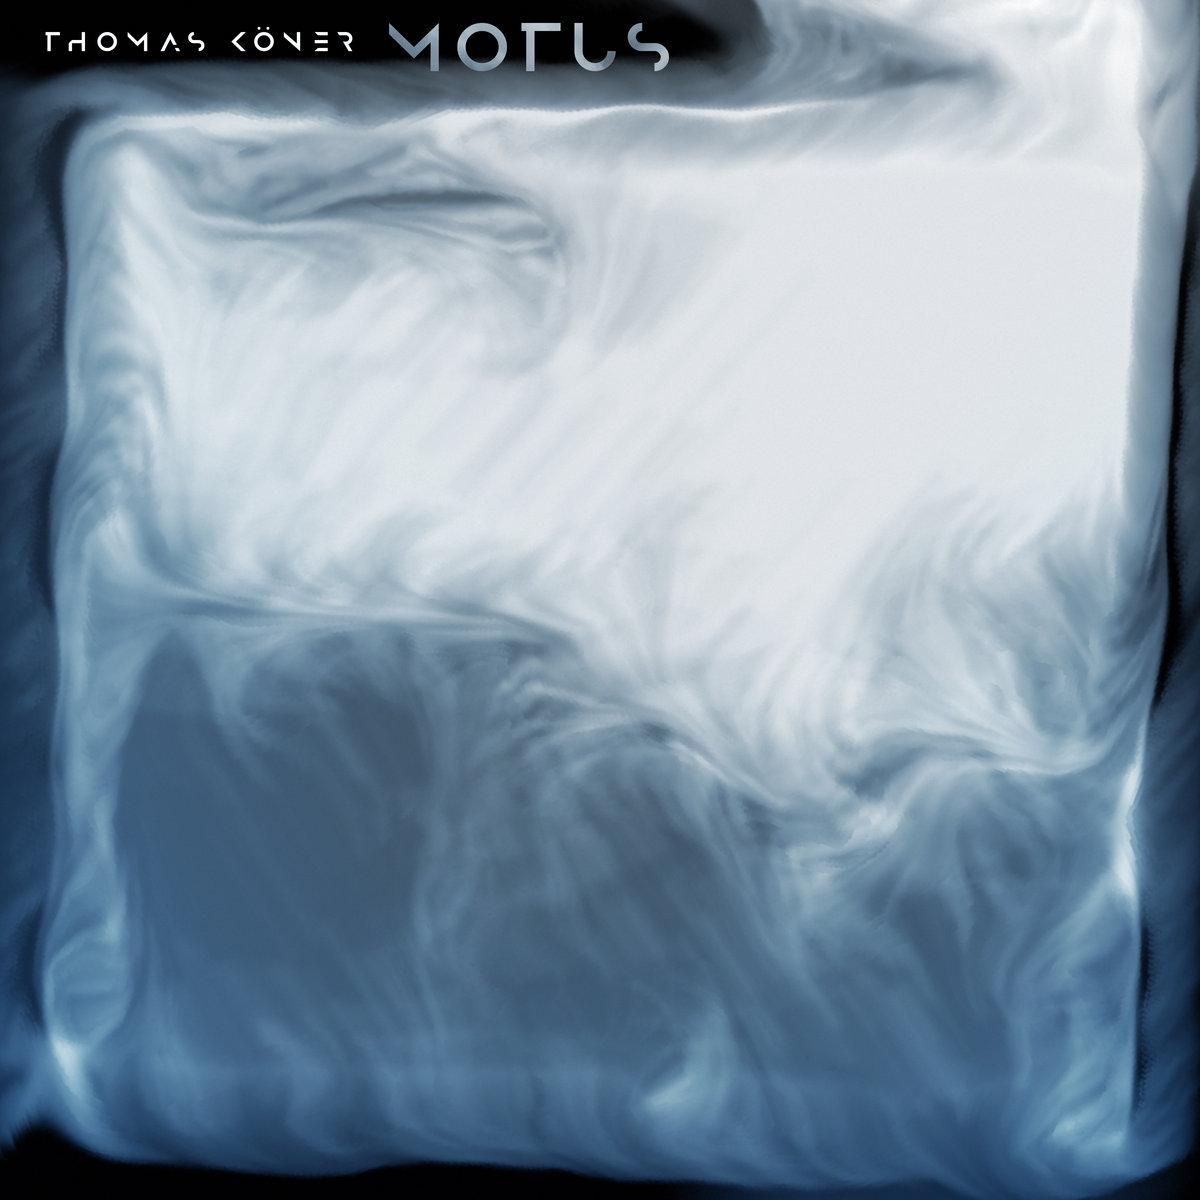 Thomas Köner  – Motus